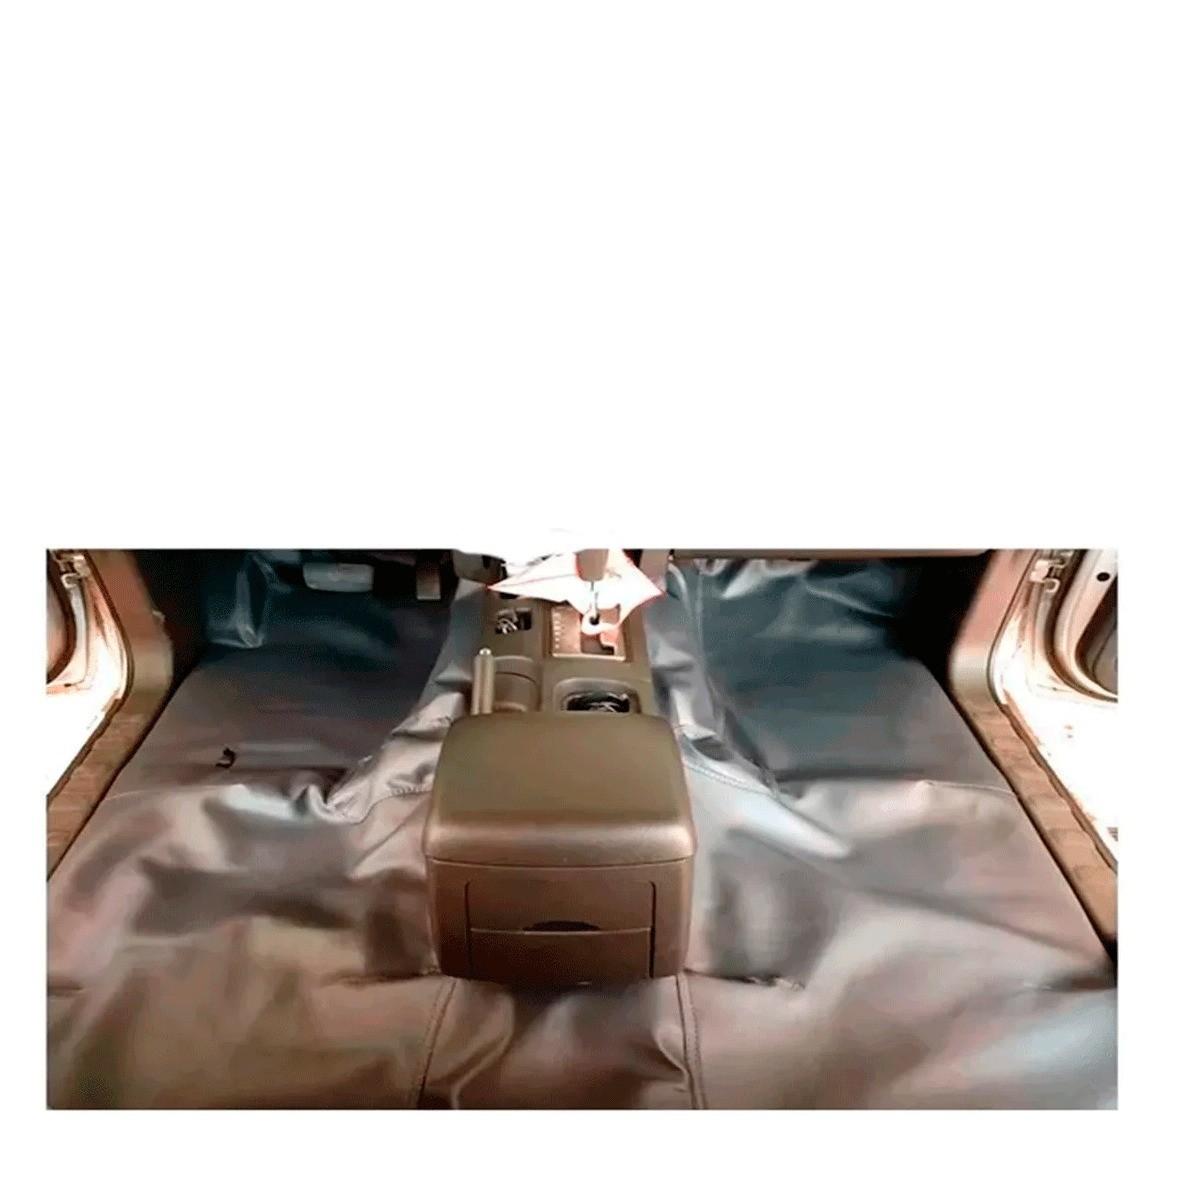 Tapete Automotivo Assoalho Emborrachado Bidim Ford Ká 2014 a 2020